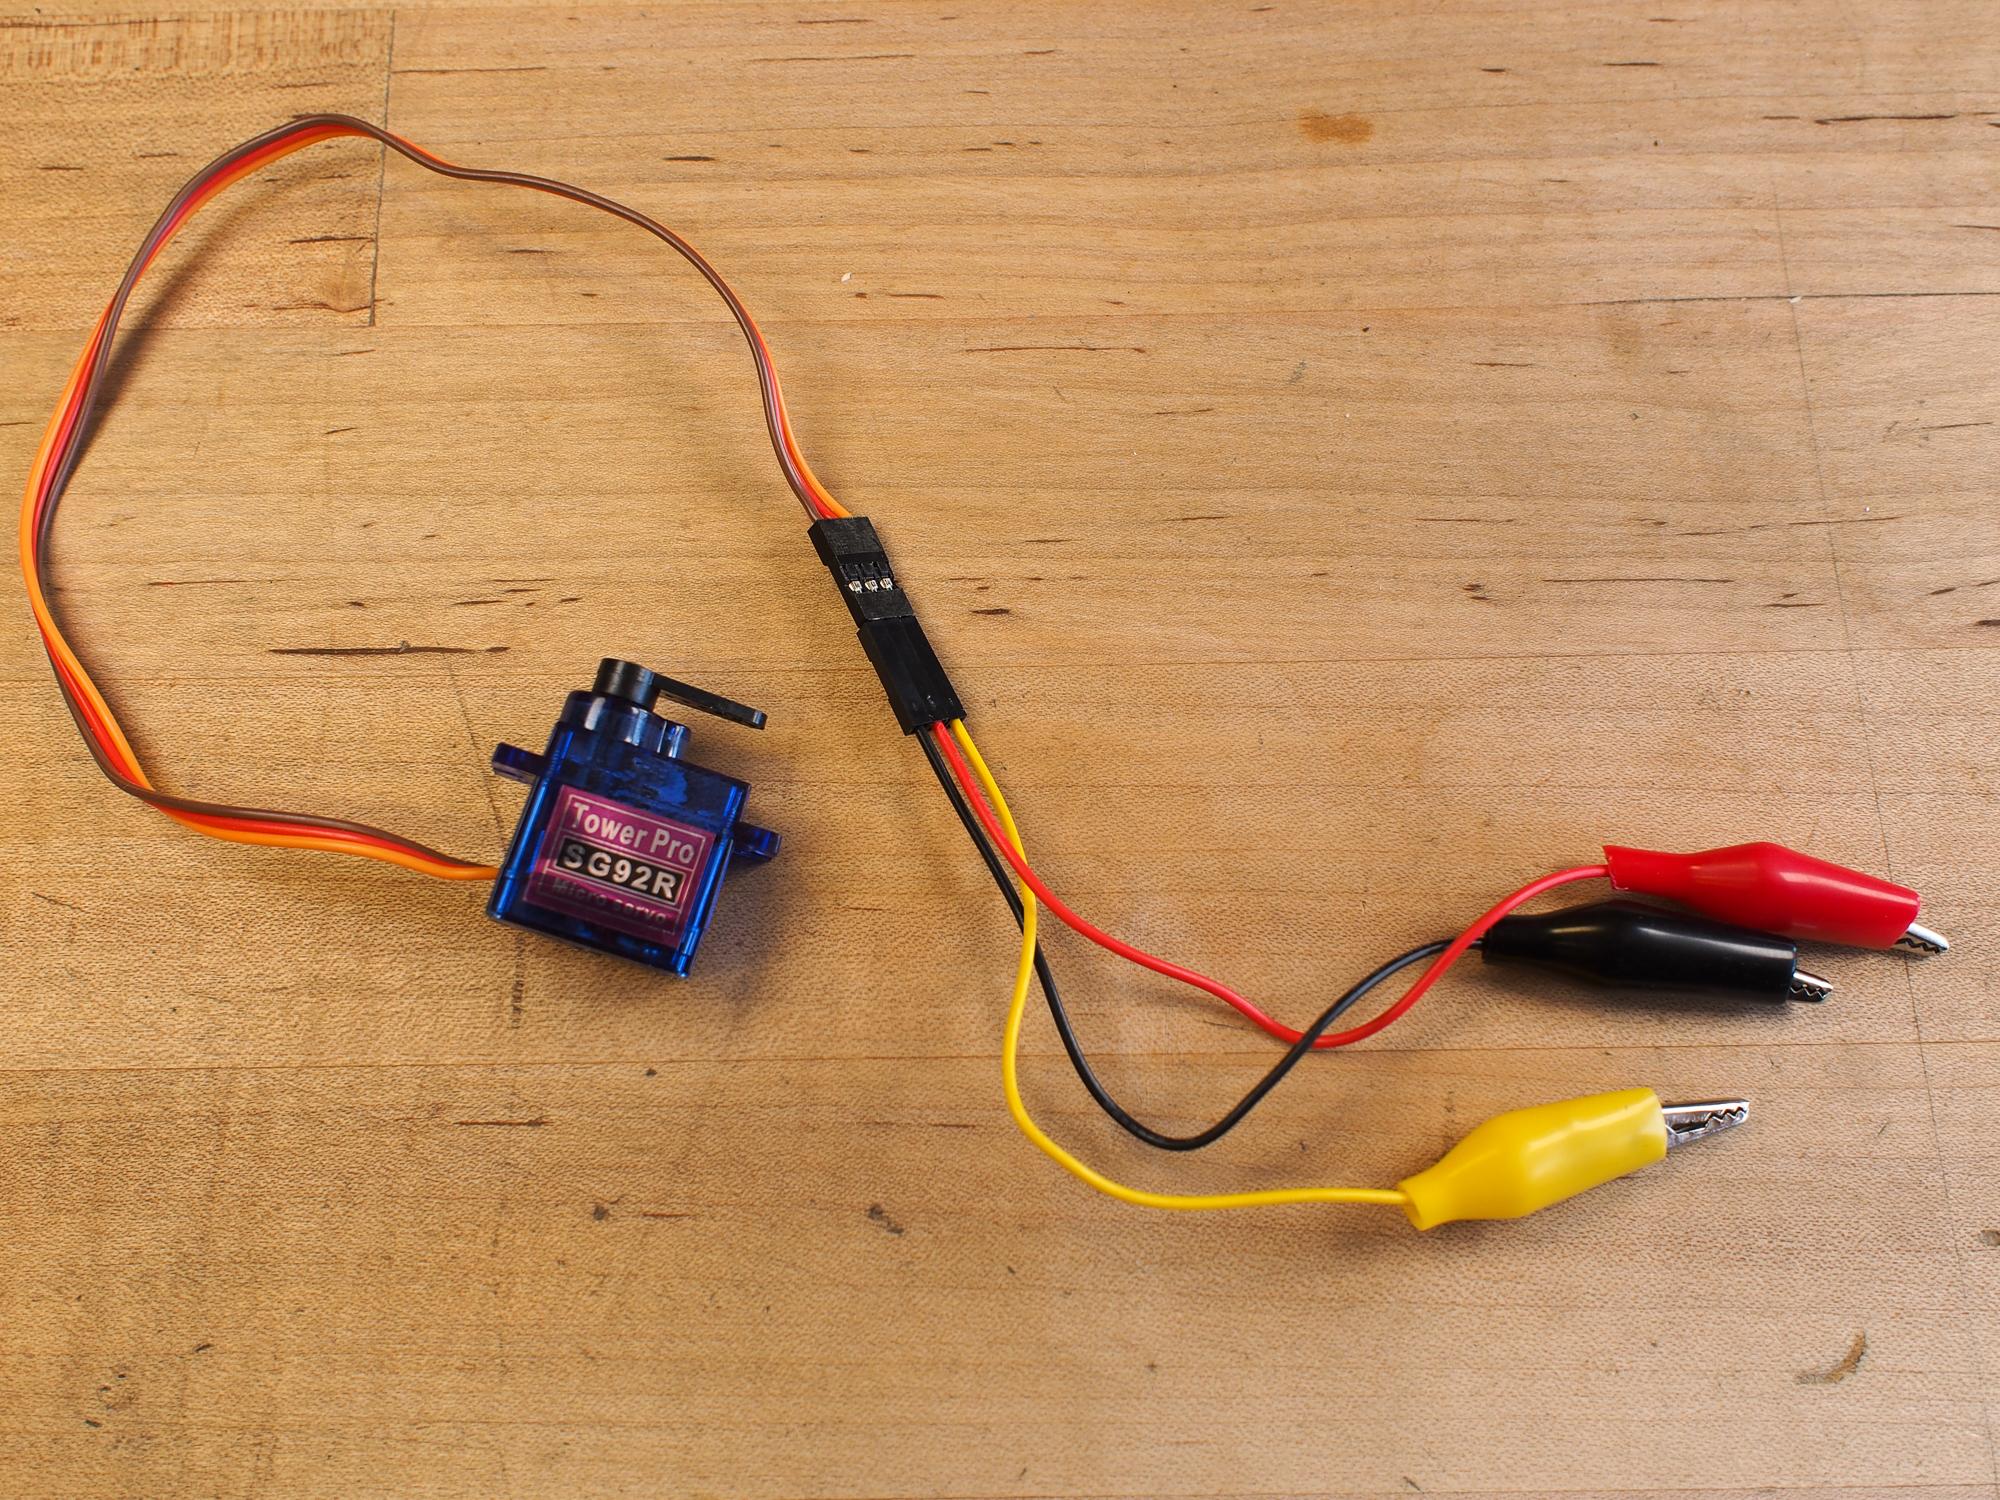 circuitpython_PC080466_2k.jpg